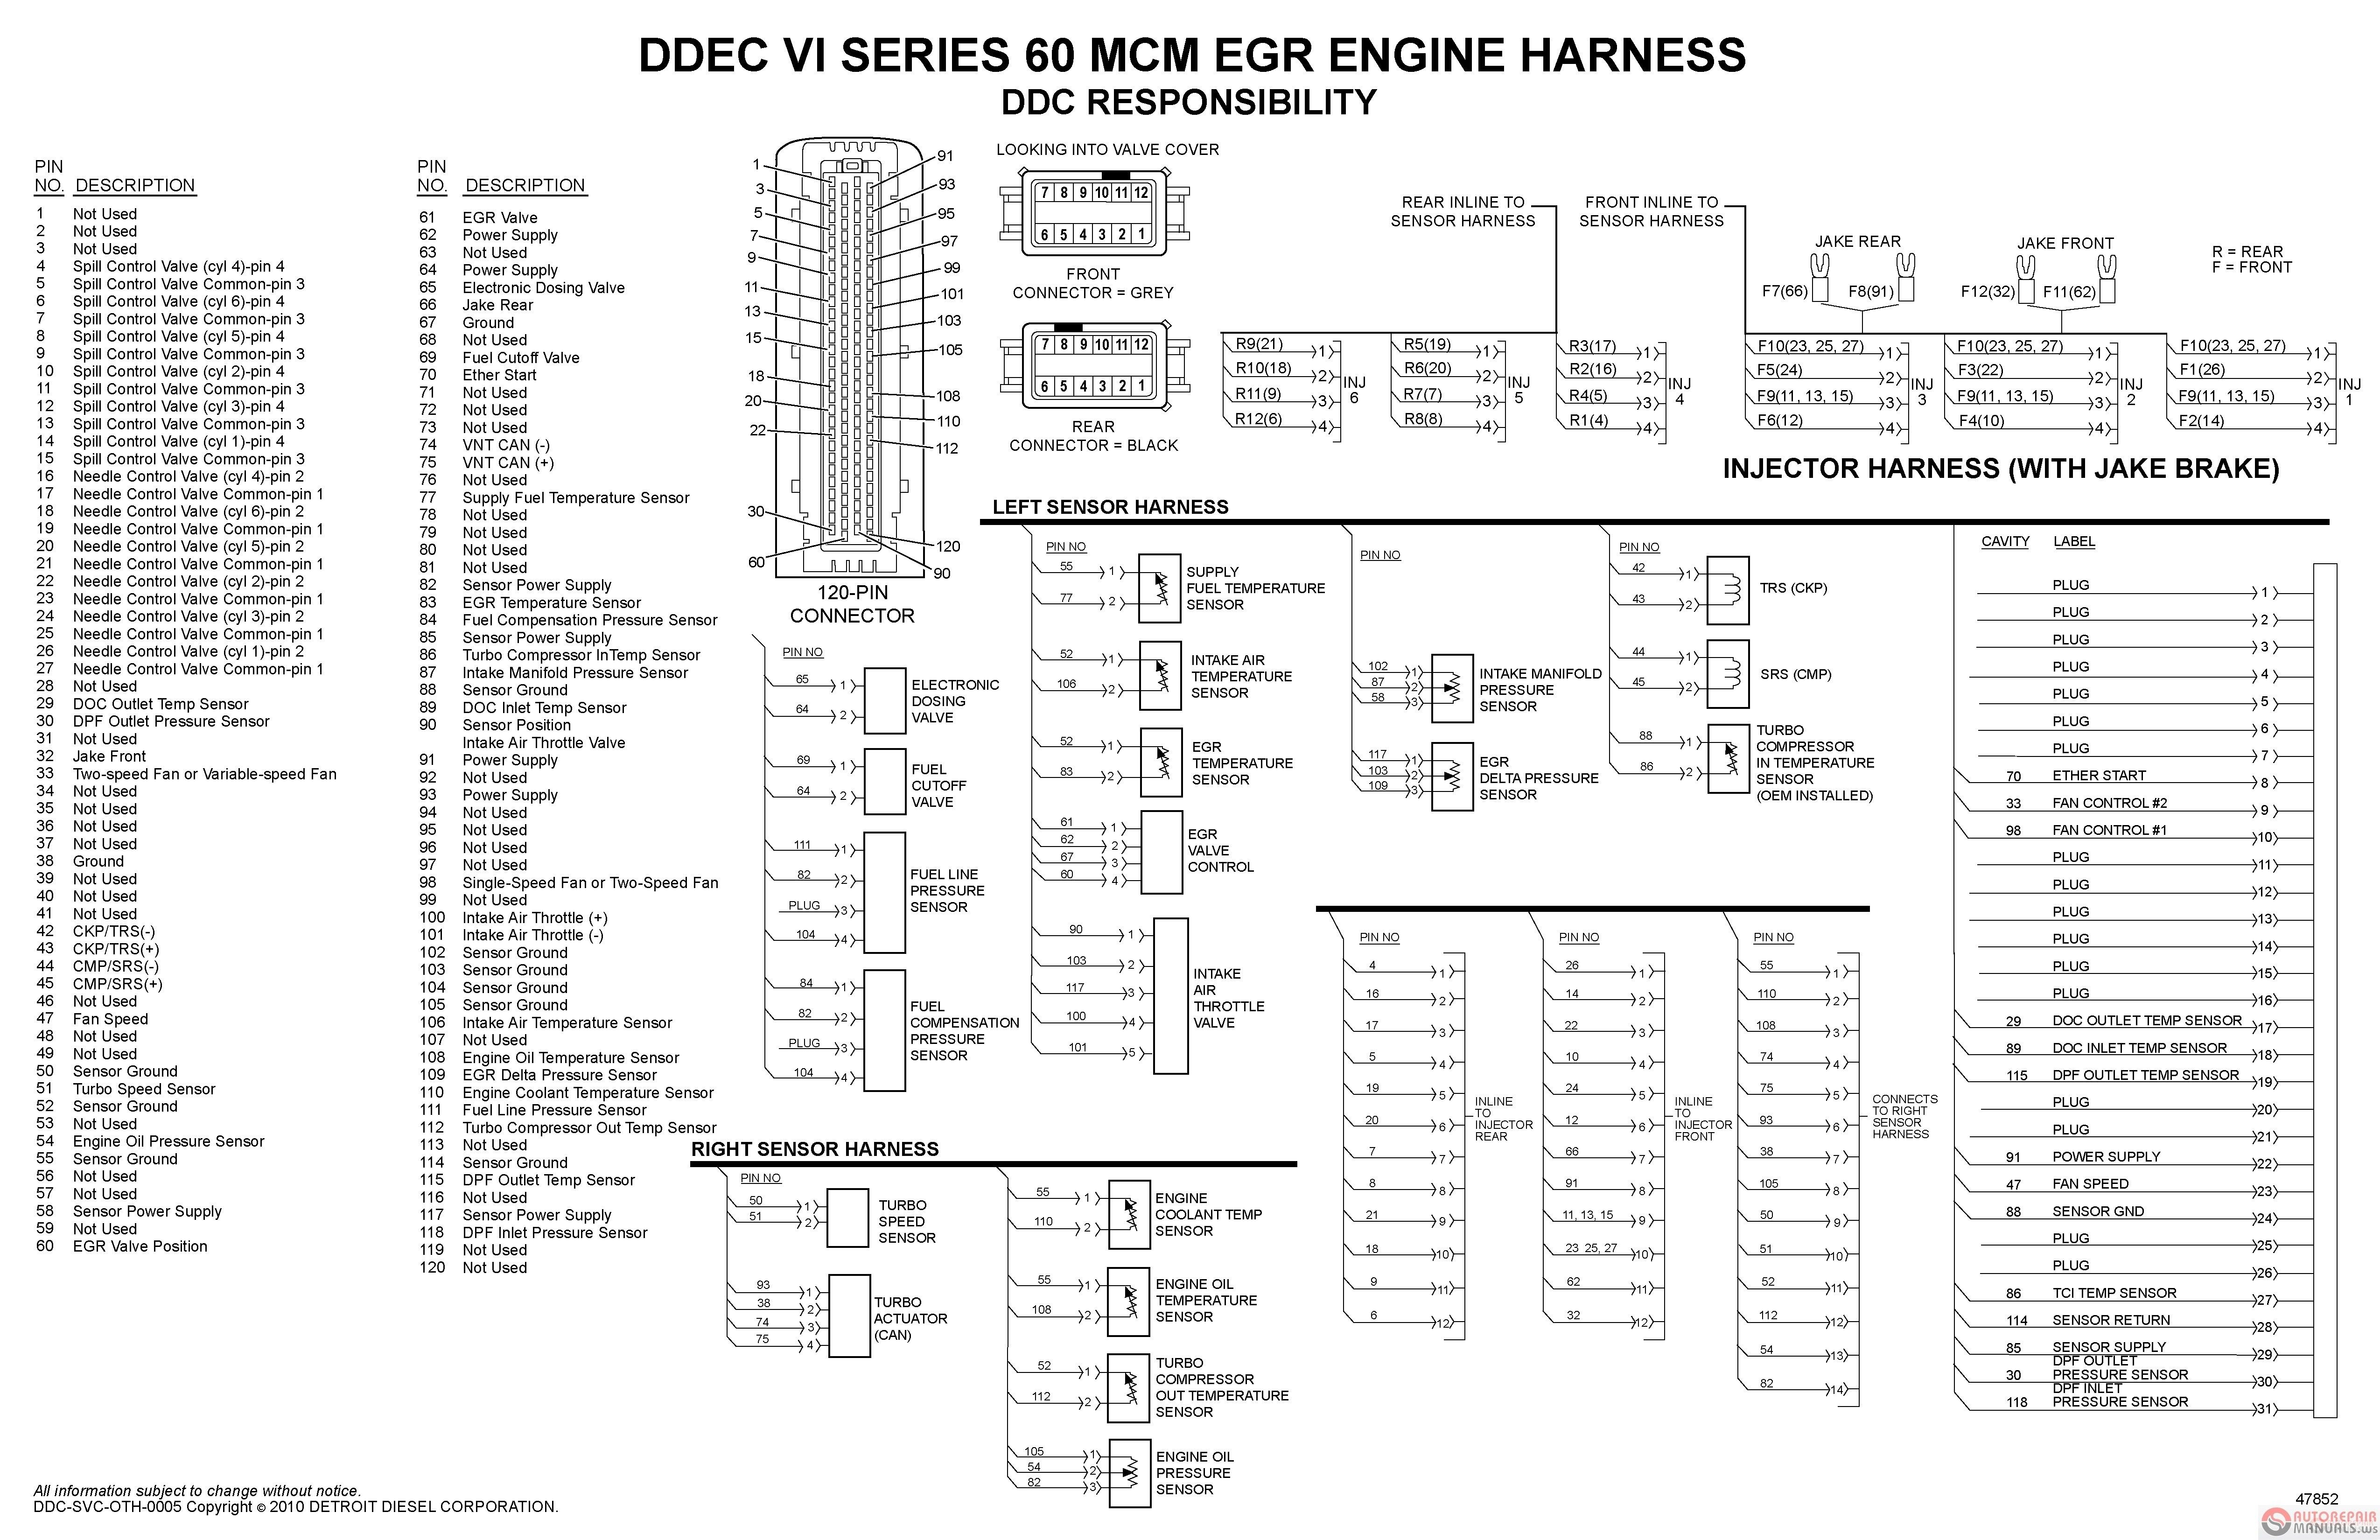 Awesome Ddec V Wiring Diagram In 2020 Detroit Diesel Detroit Detroit Motors